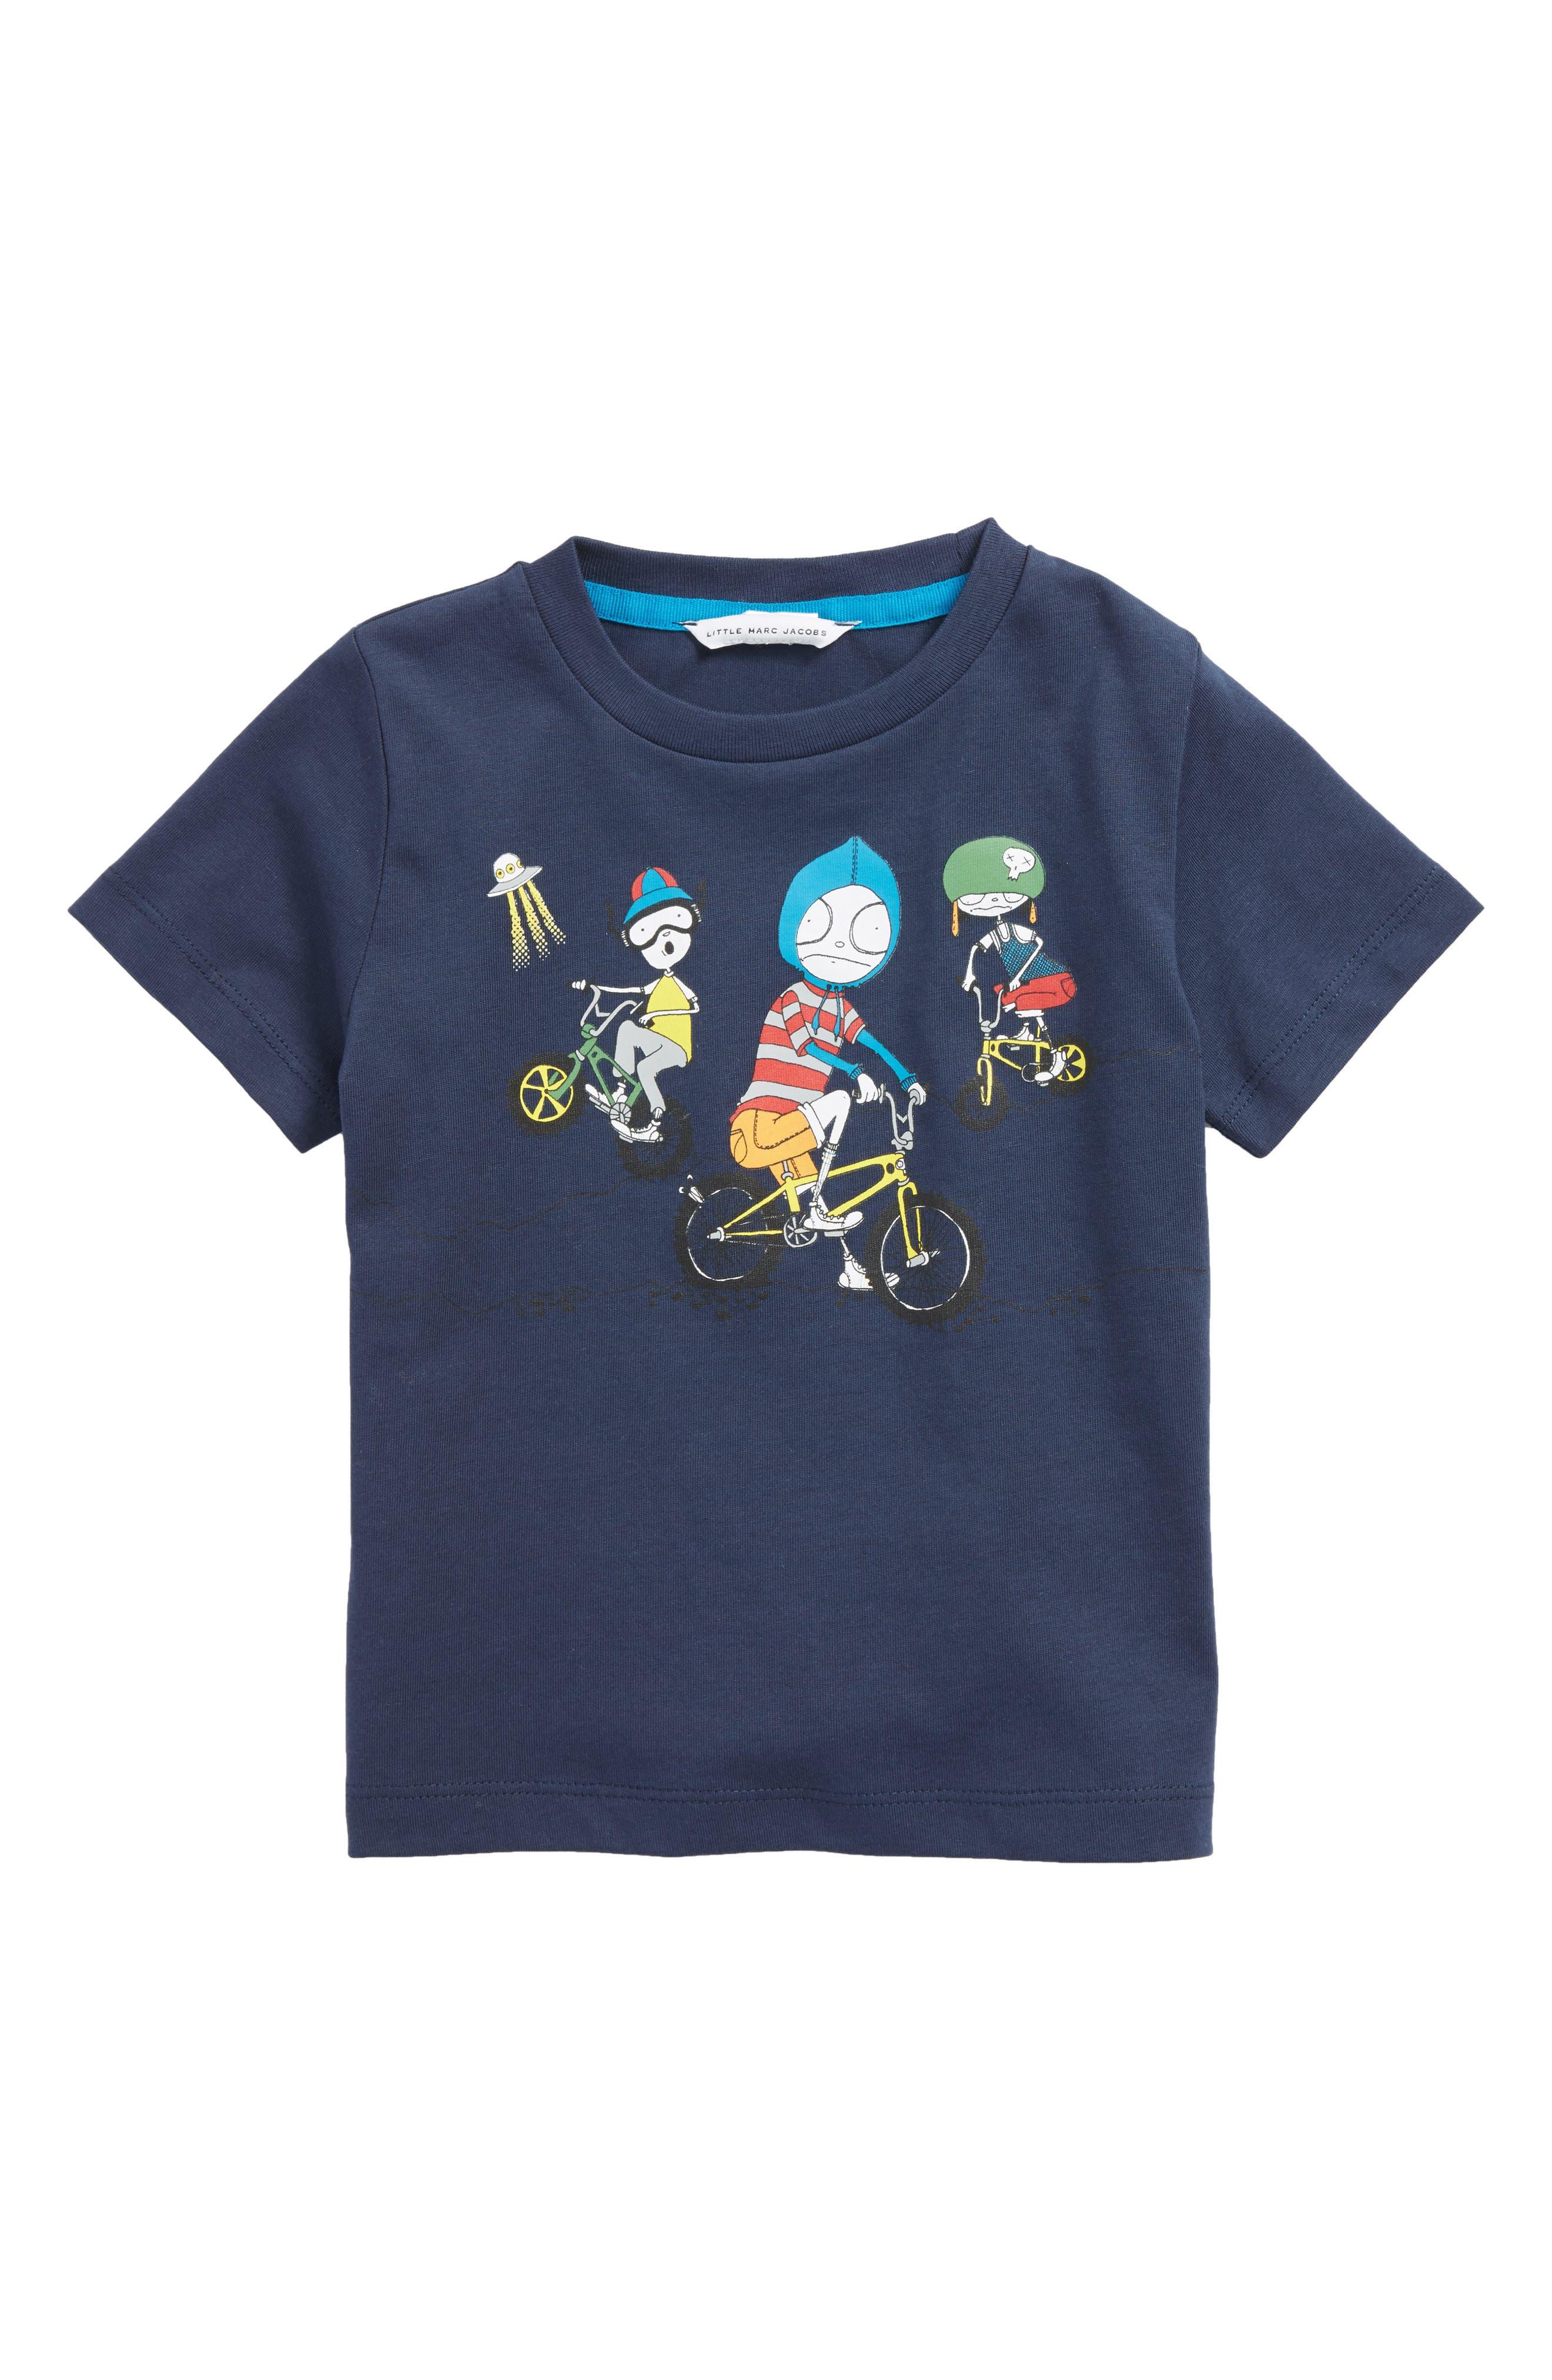 Mister Marc T-Shirt,                             Main thumbnail 1, color,                             401